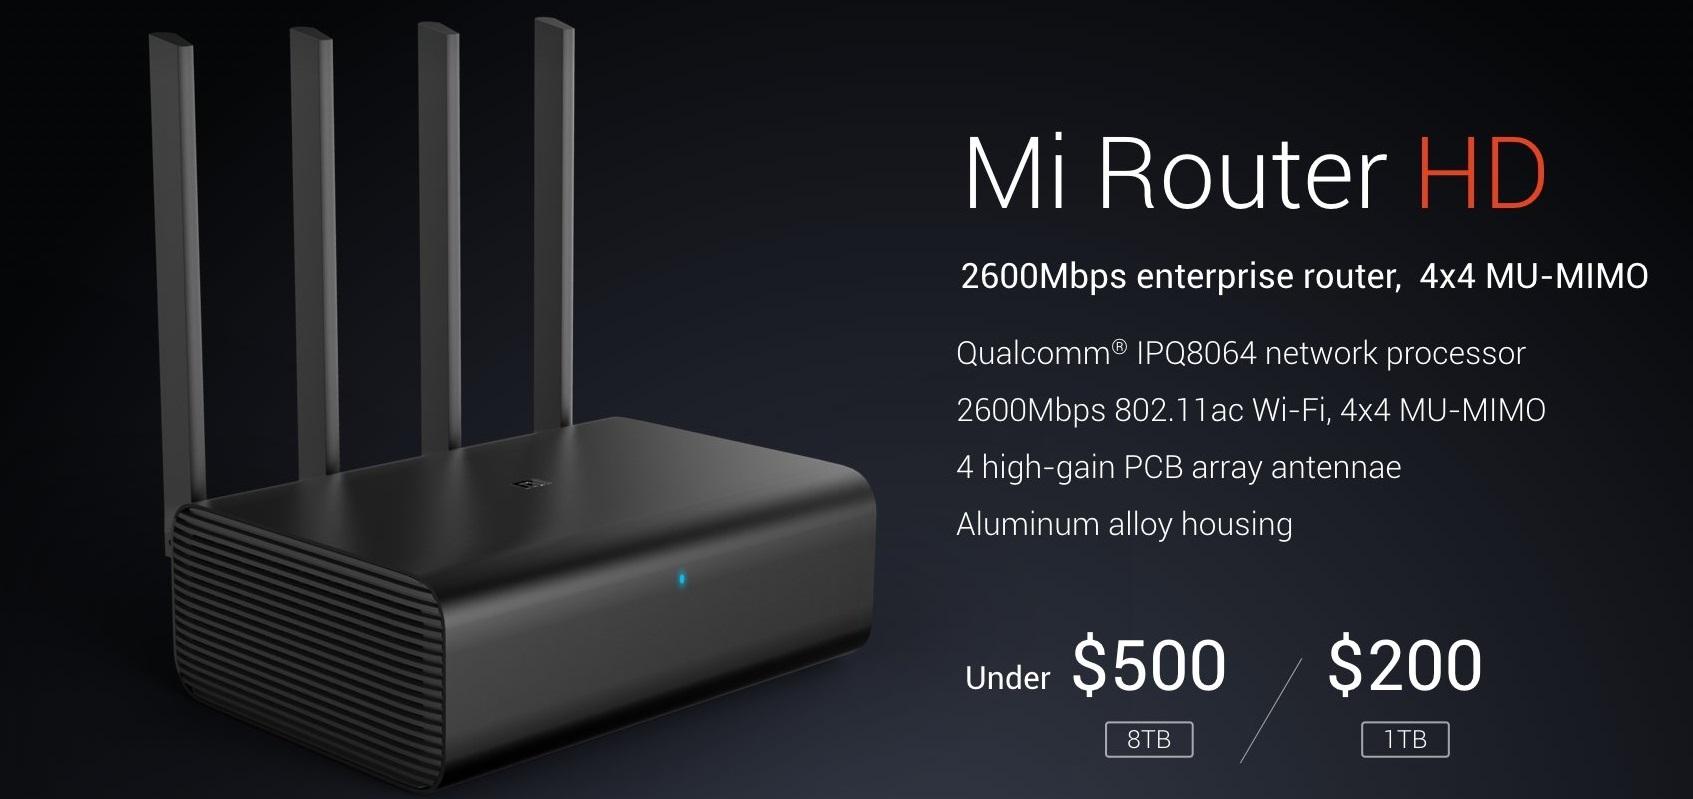 Xiaomi Mi Router HD: Router de aluminio con almacenamiento interno